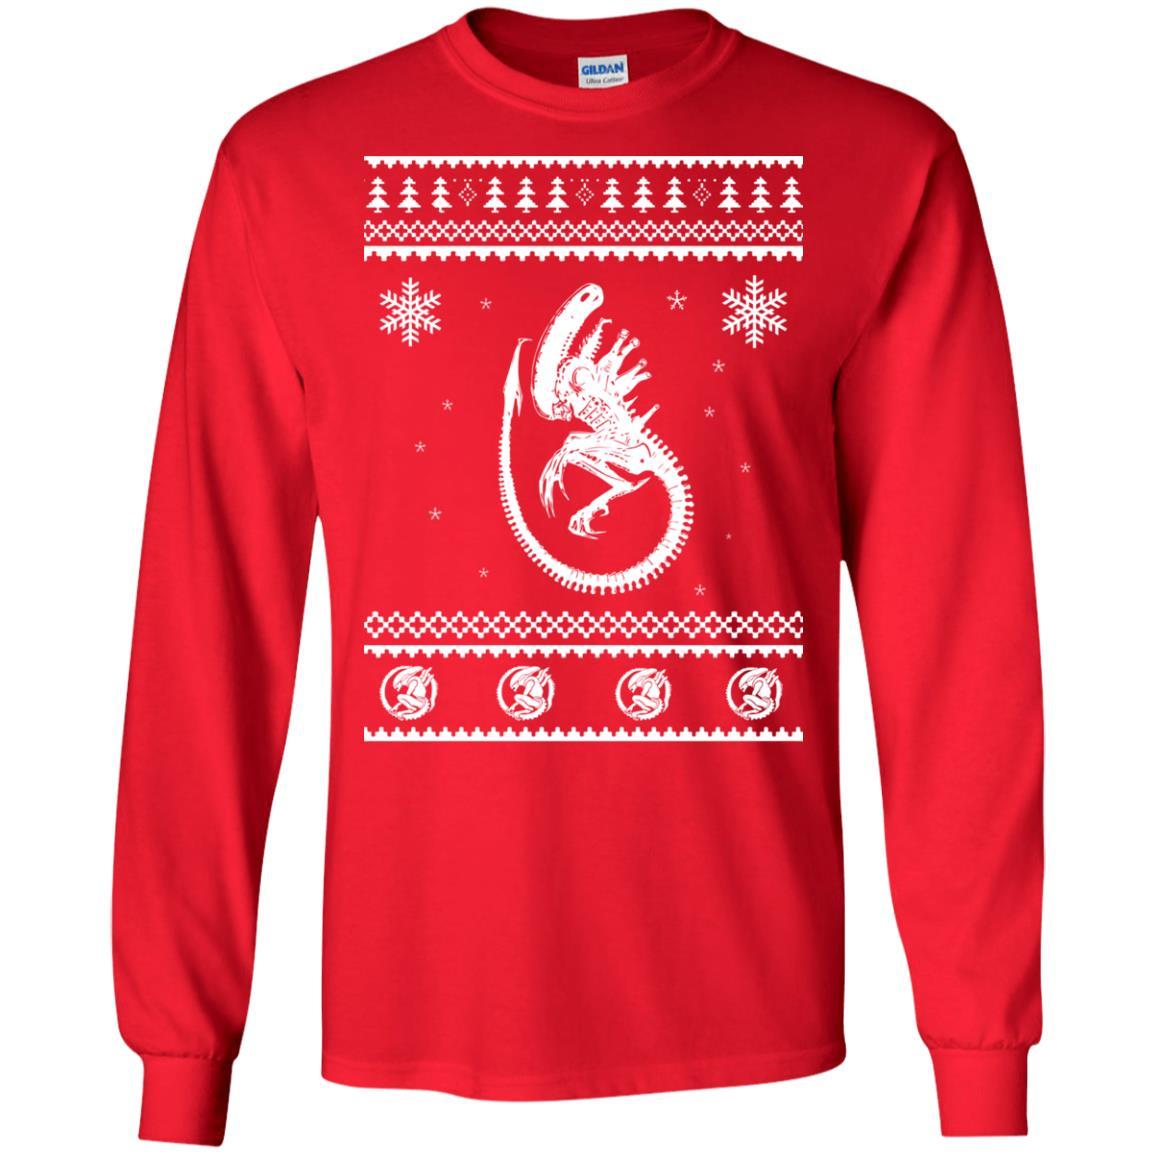 image 2843 - Xeno-mas - Aliens Xenomorph Christmas Sweater, Shirt, Hoodie